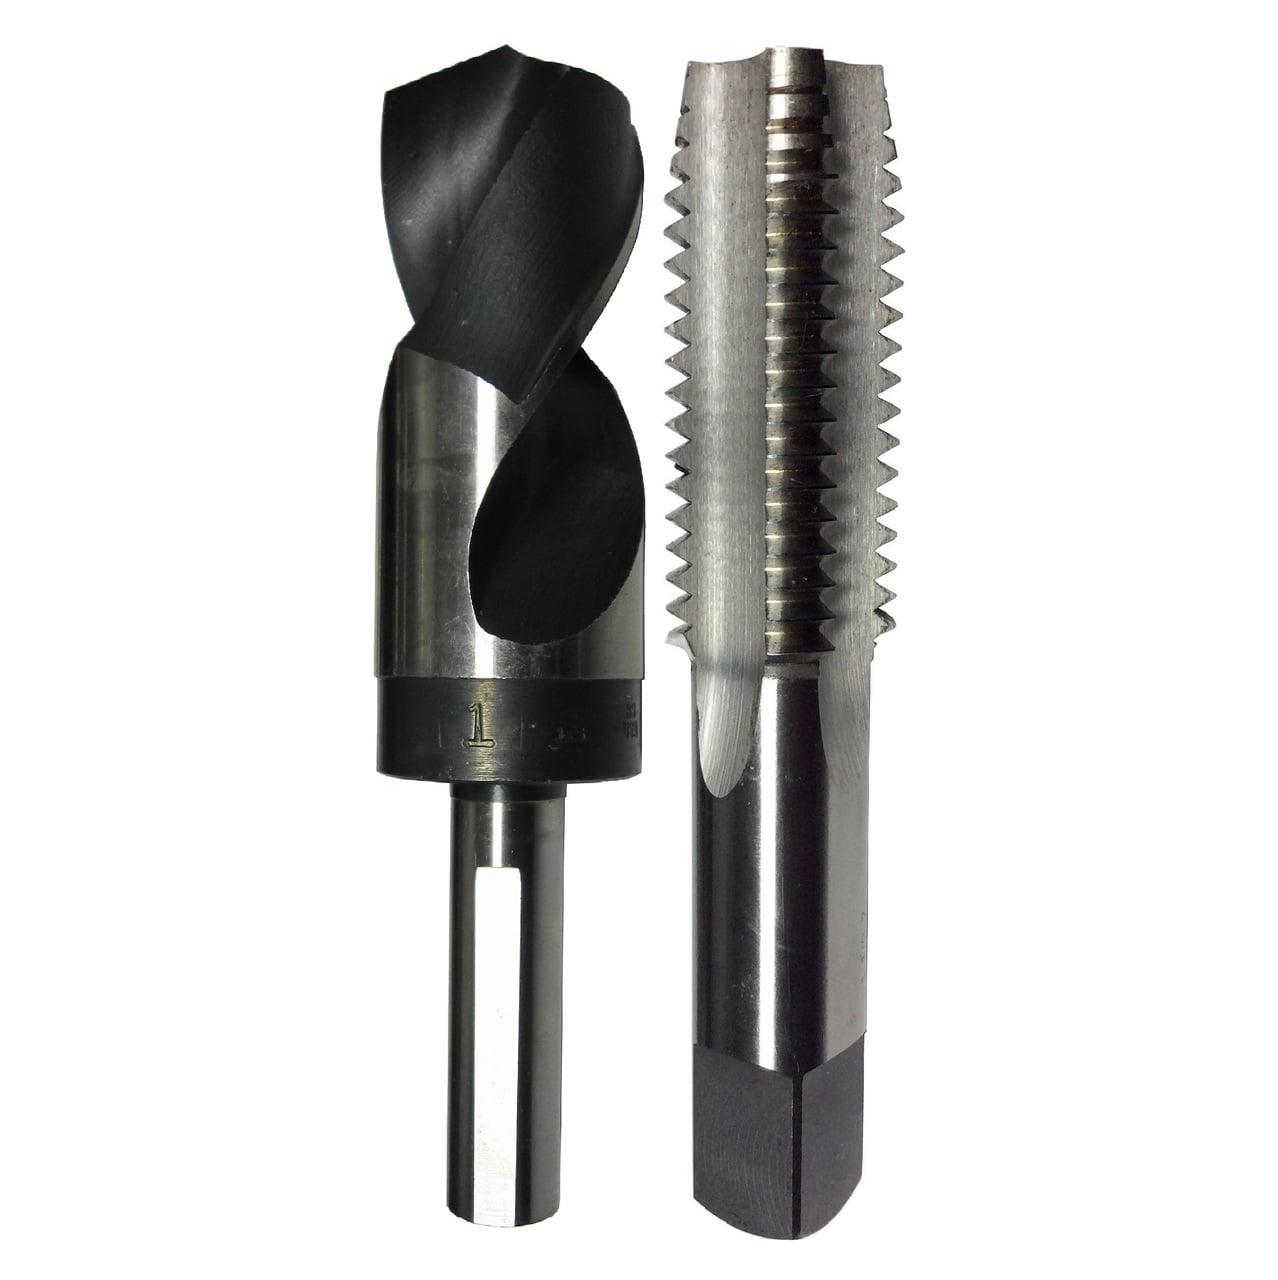 Pack of 1 Drill America m22 x 1.25 High Speed Steel Plug Tap,